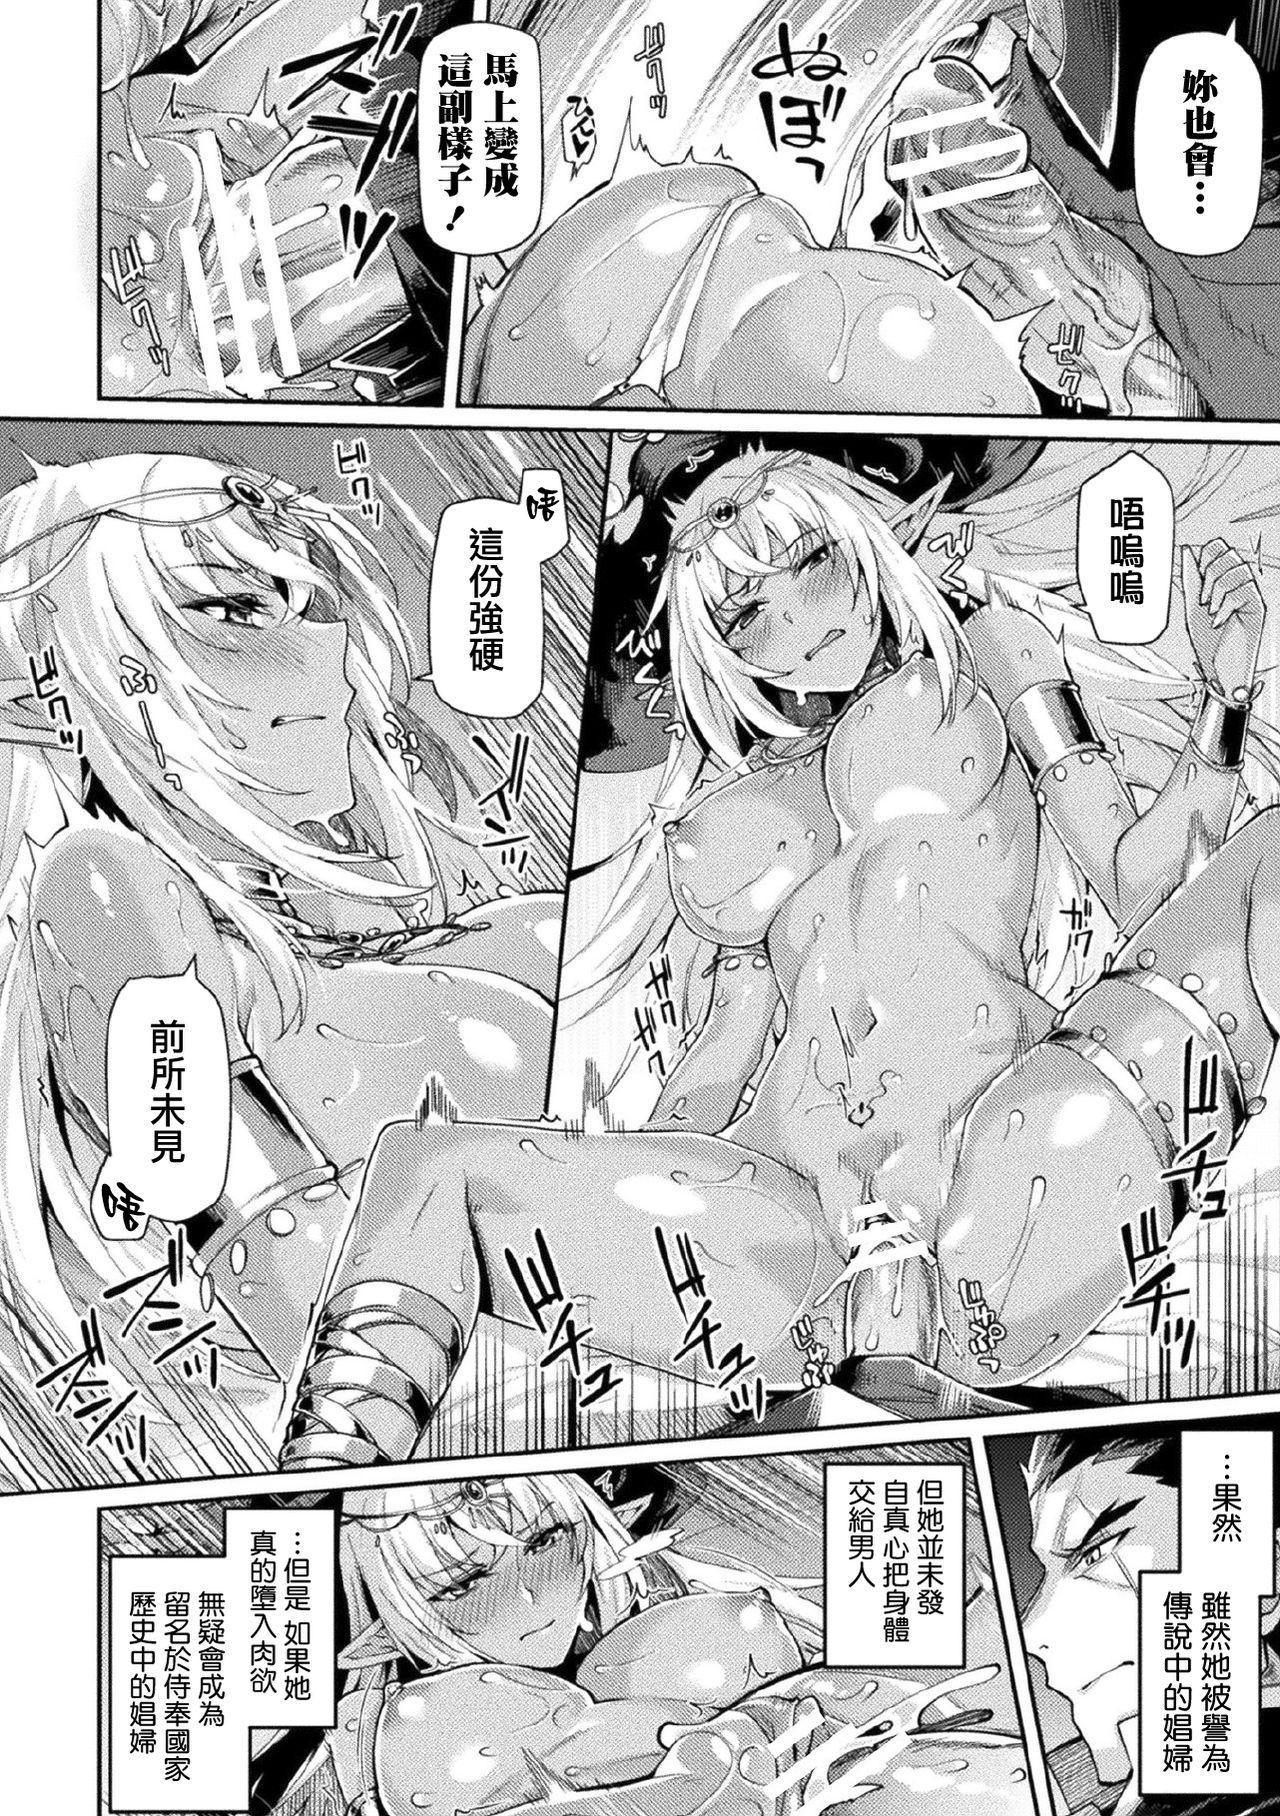 [Tsukitokage] Kuroinu II ~Inyoku ni Somaru Haitoku no Miyako, Futatabi~ THE COMIC Chapter 6 (Kukkoro Heroines Vol. 7) [Digital] [Chinese] [鬼畜王漢化組] [Digital] 14